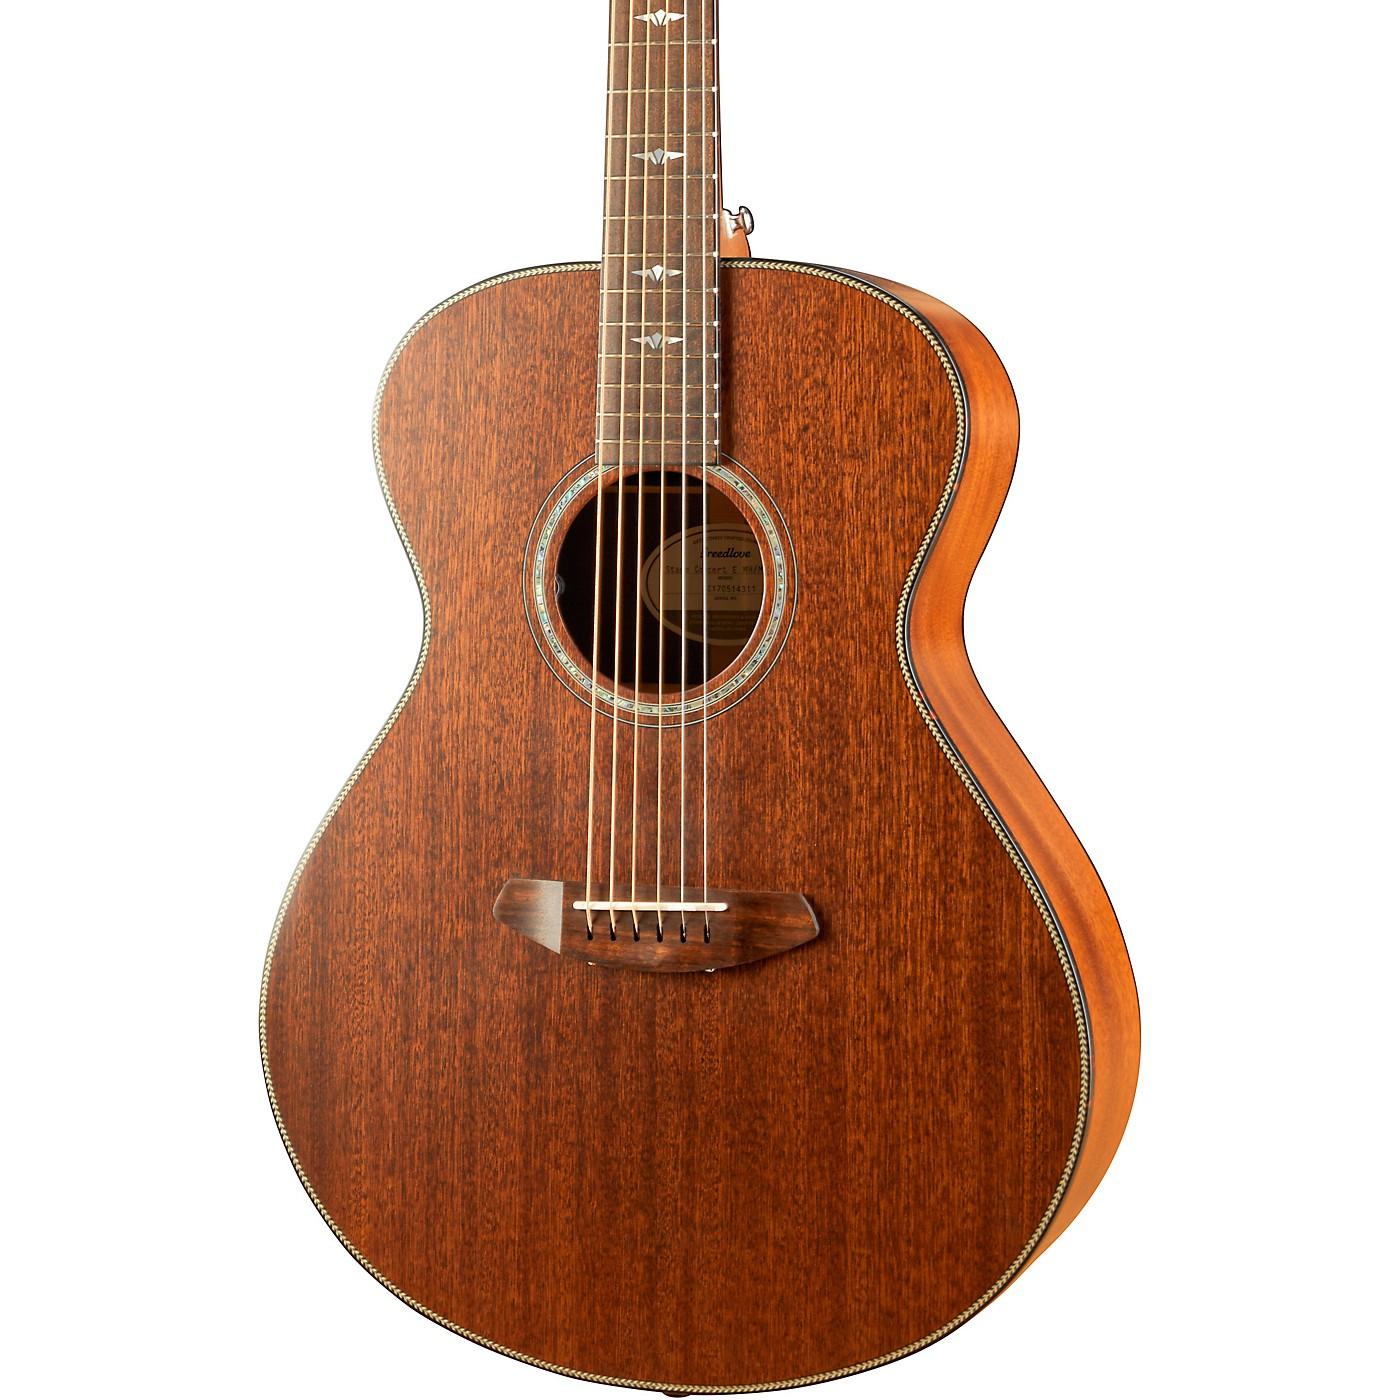 Breedlove Stage Series Concert E Mahogany-Mahogany LTD Acoustic-Electric Guitar thumbnail